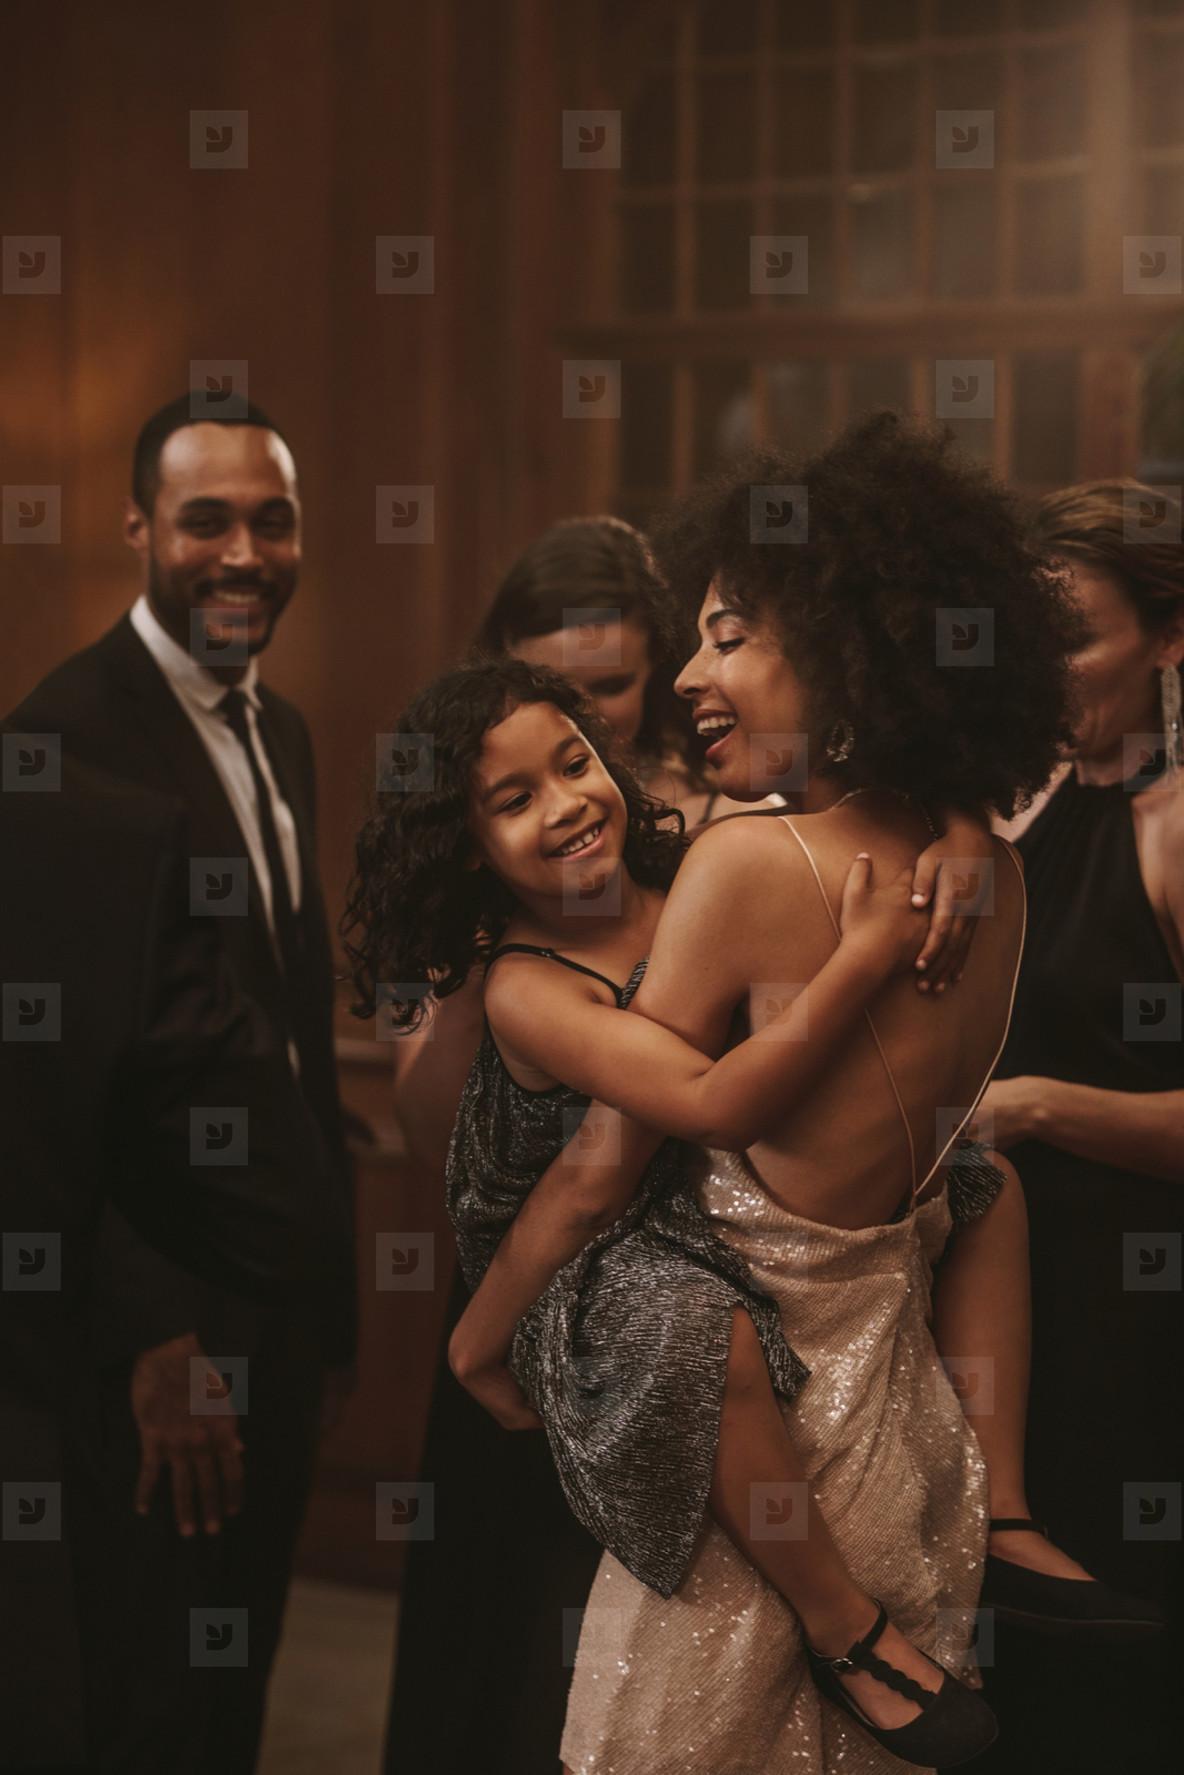 Woman dancing with her cute girl at gala night